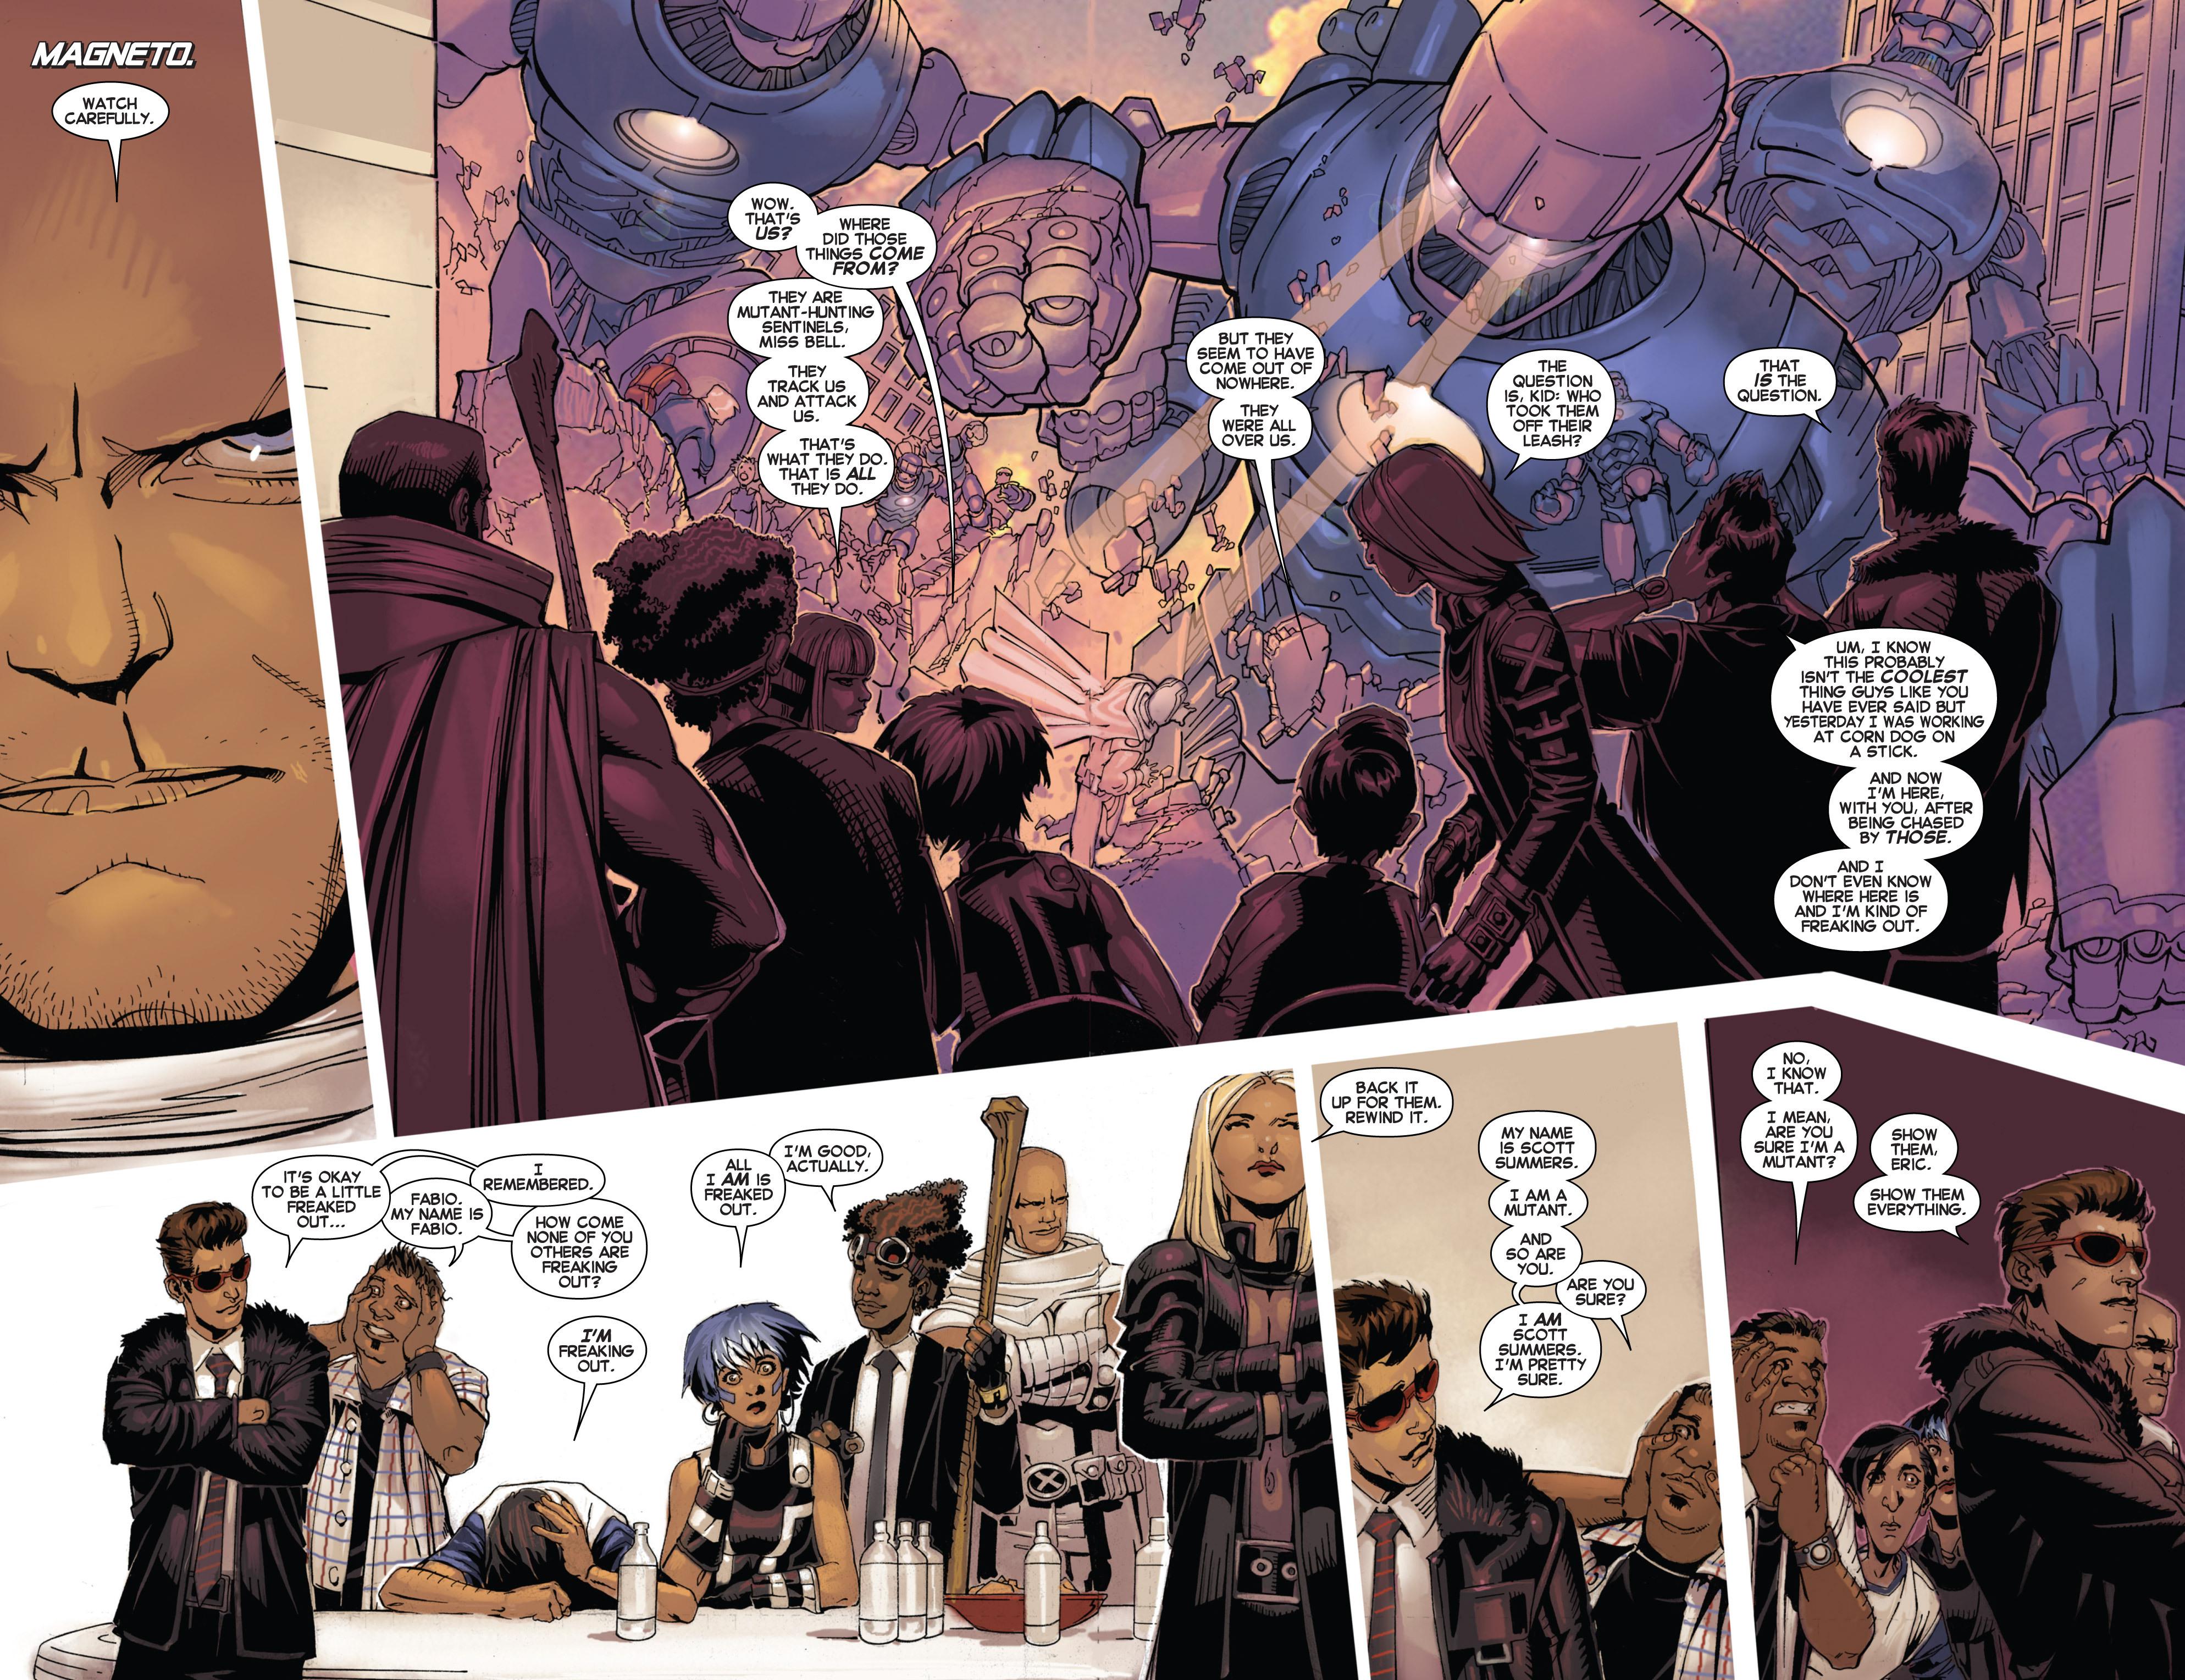 Read online Uncanny X-Men (2013) comic -  Issue # _TPB 1 - Revolution - 34